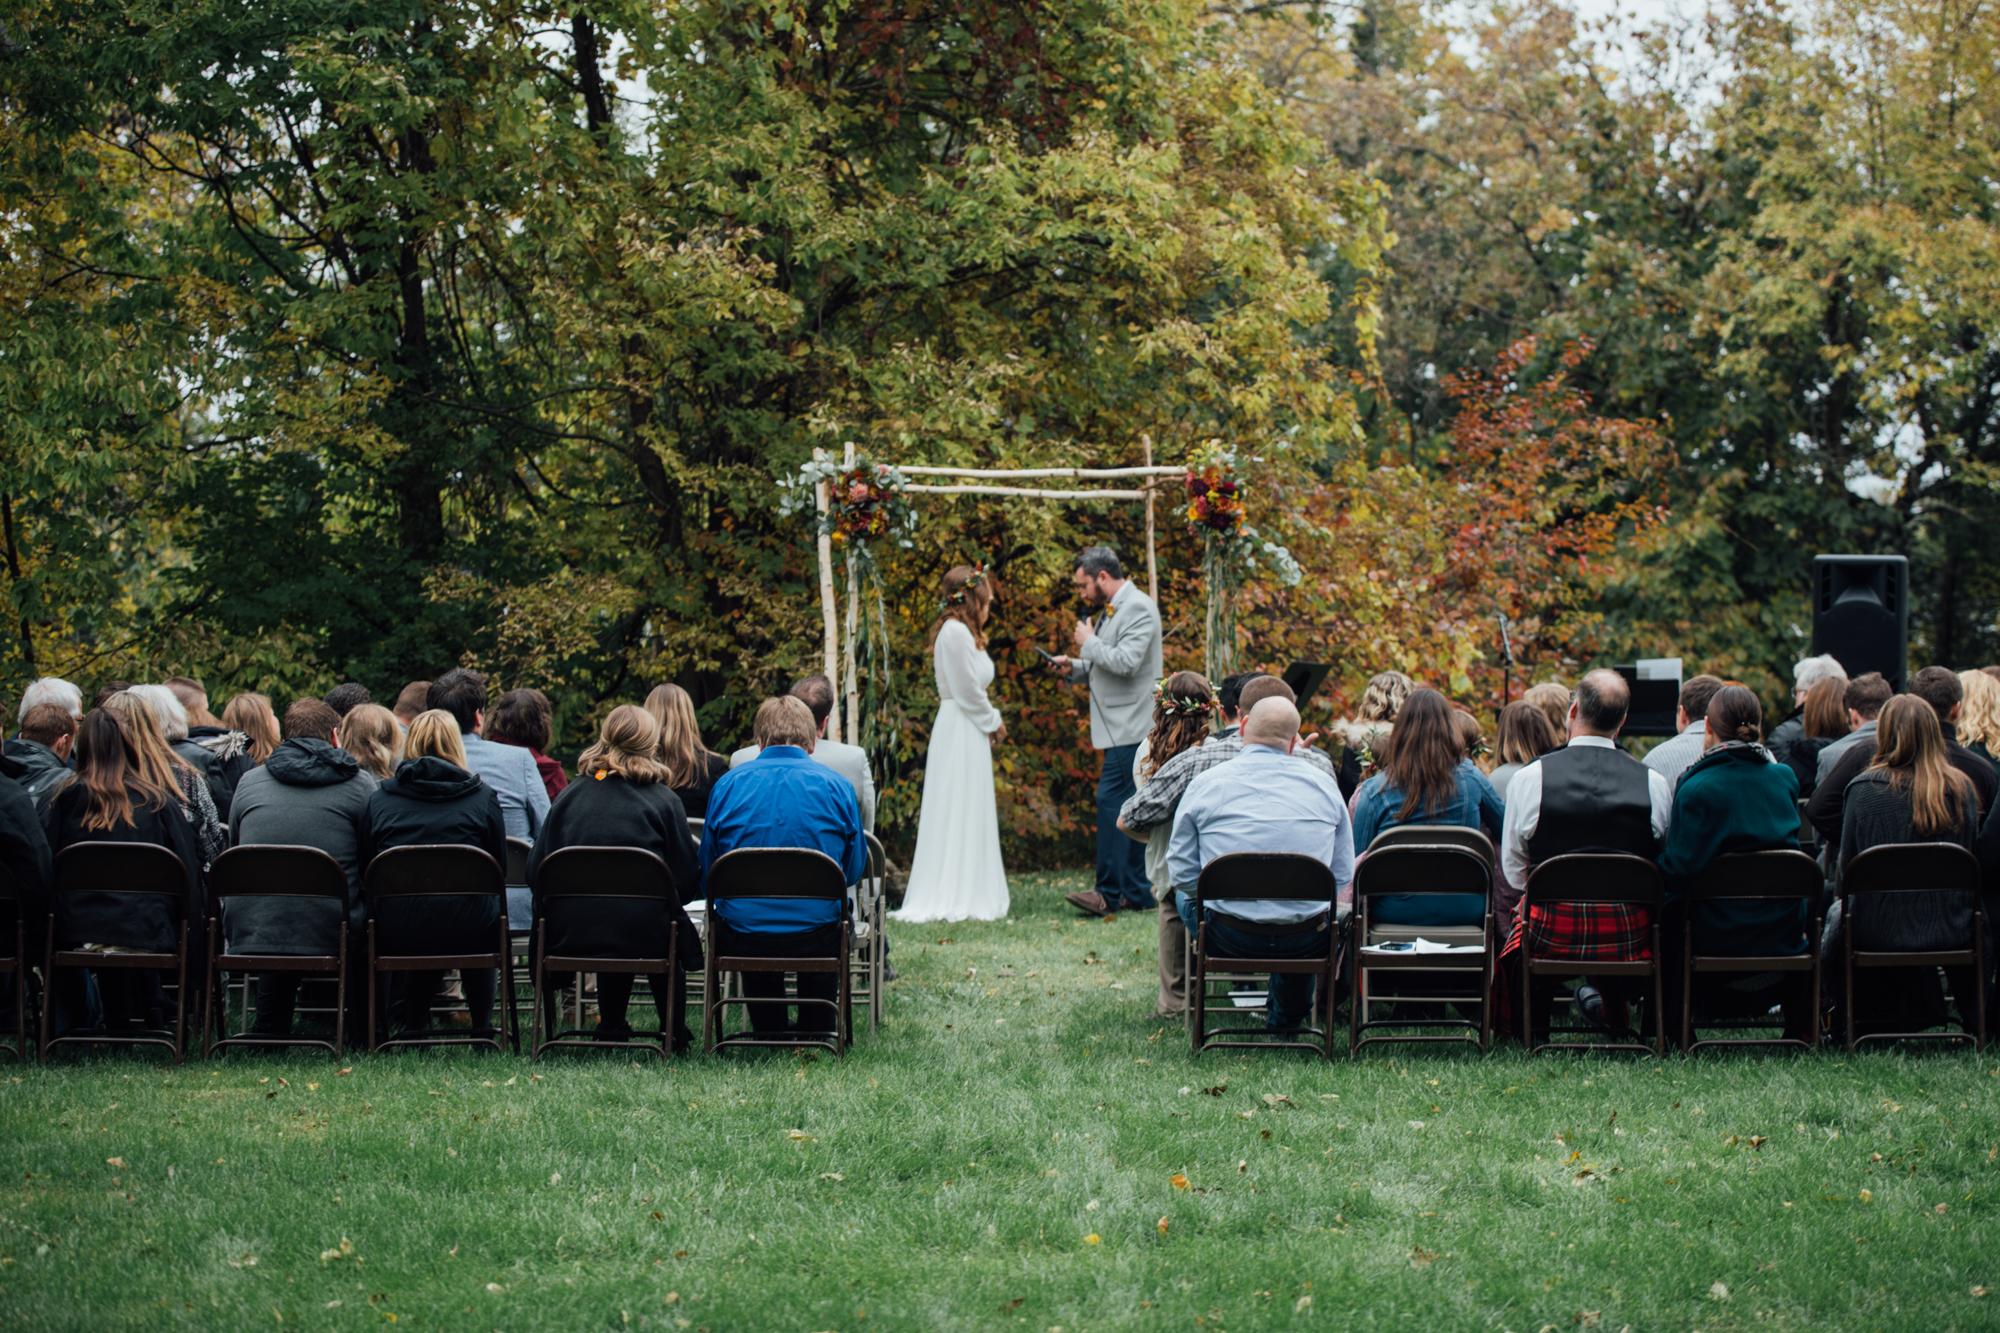 minneapolis-wedding-photographer-1-10.jpg